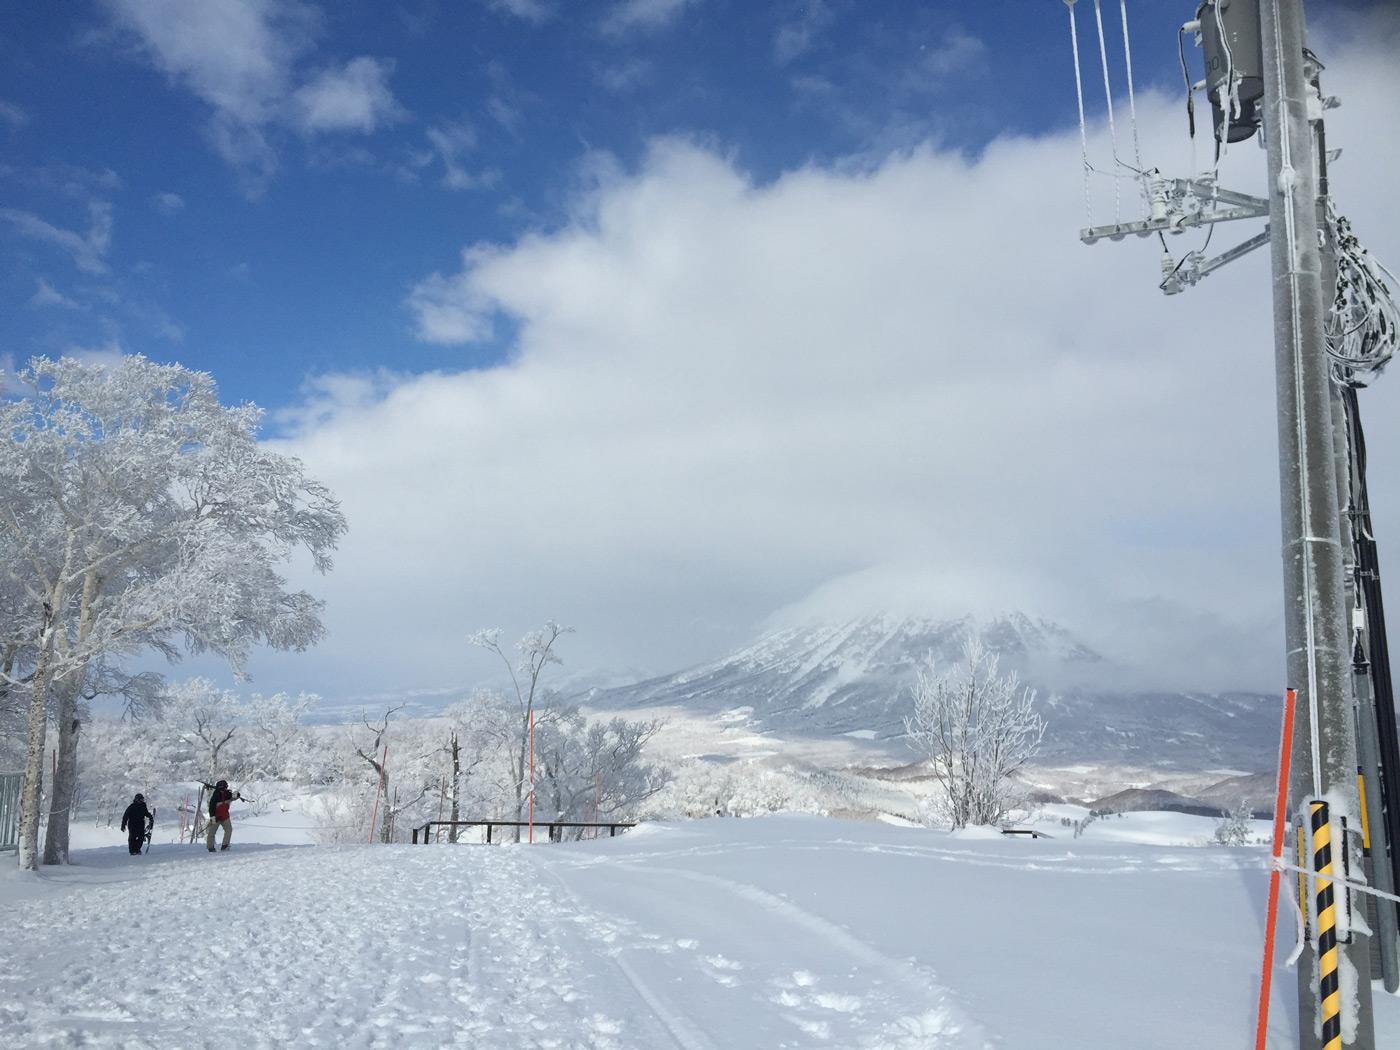 Mt Yotei coming through the clouds at Rusutsu